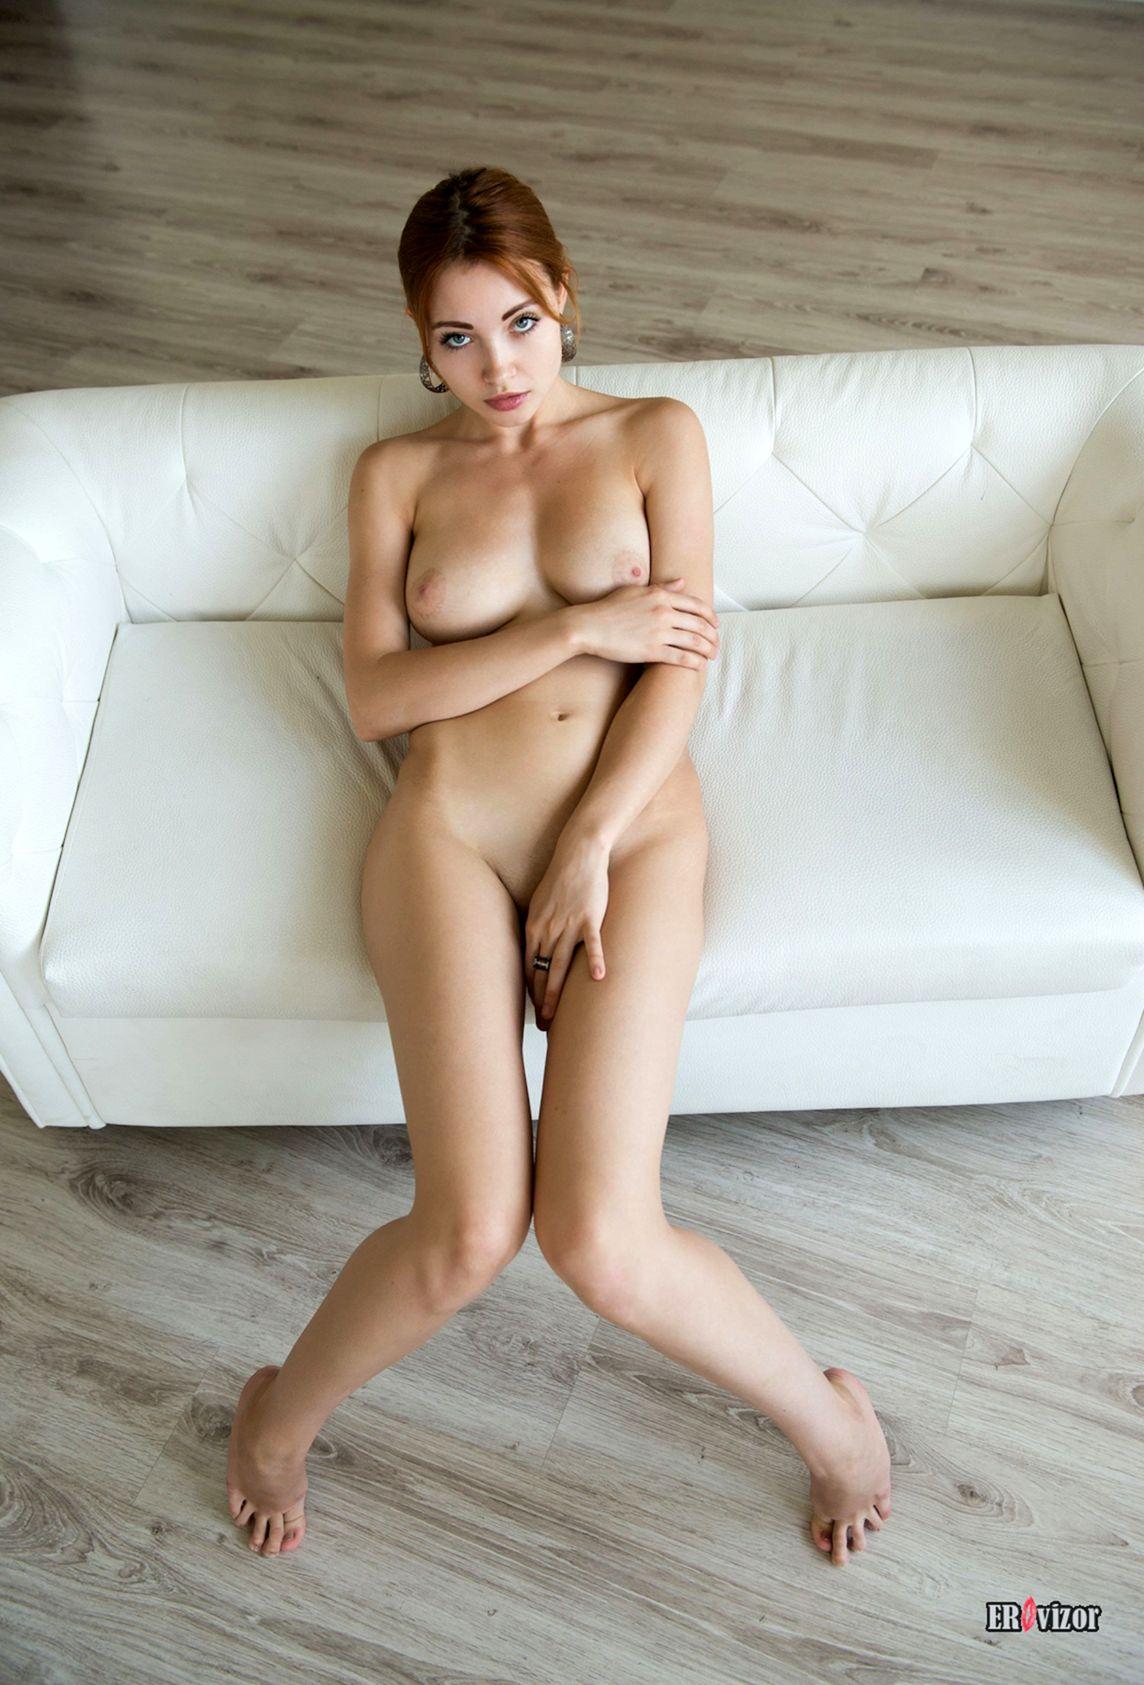 Redhead-Kika-sexy_body (1)